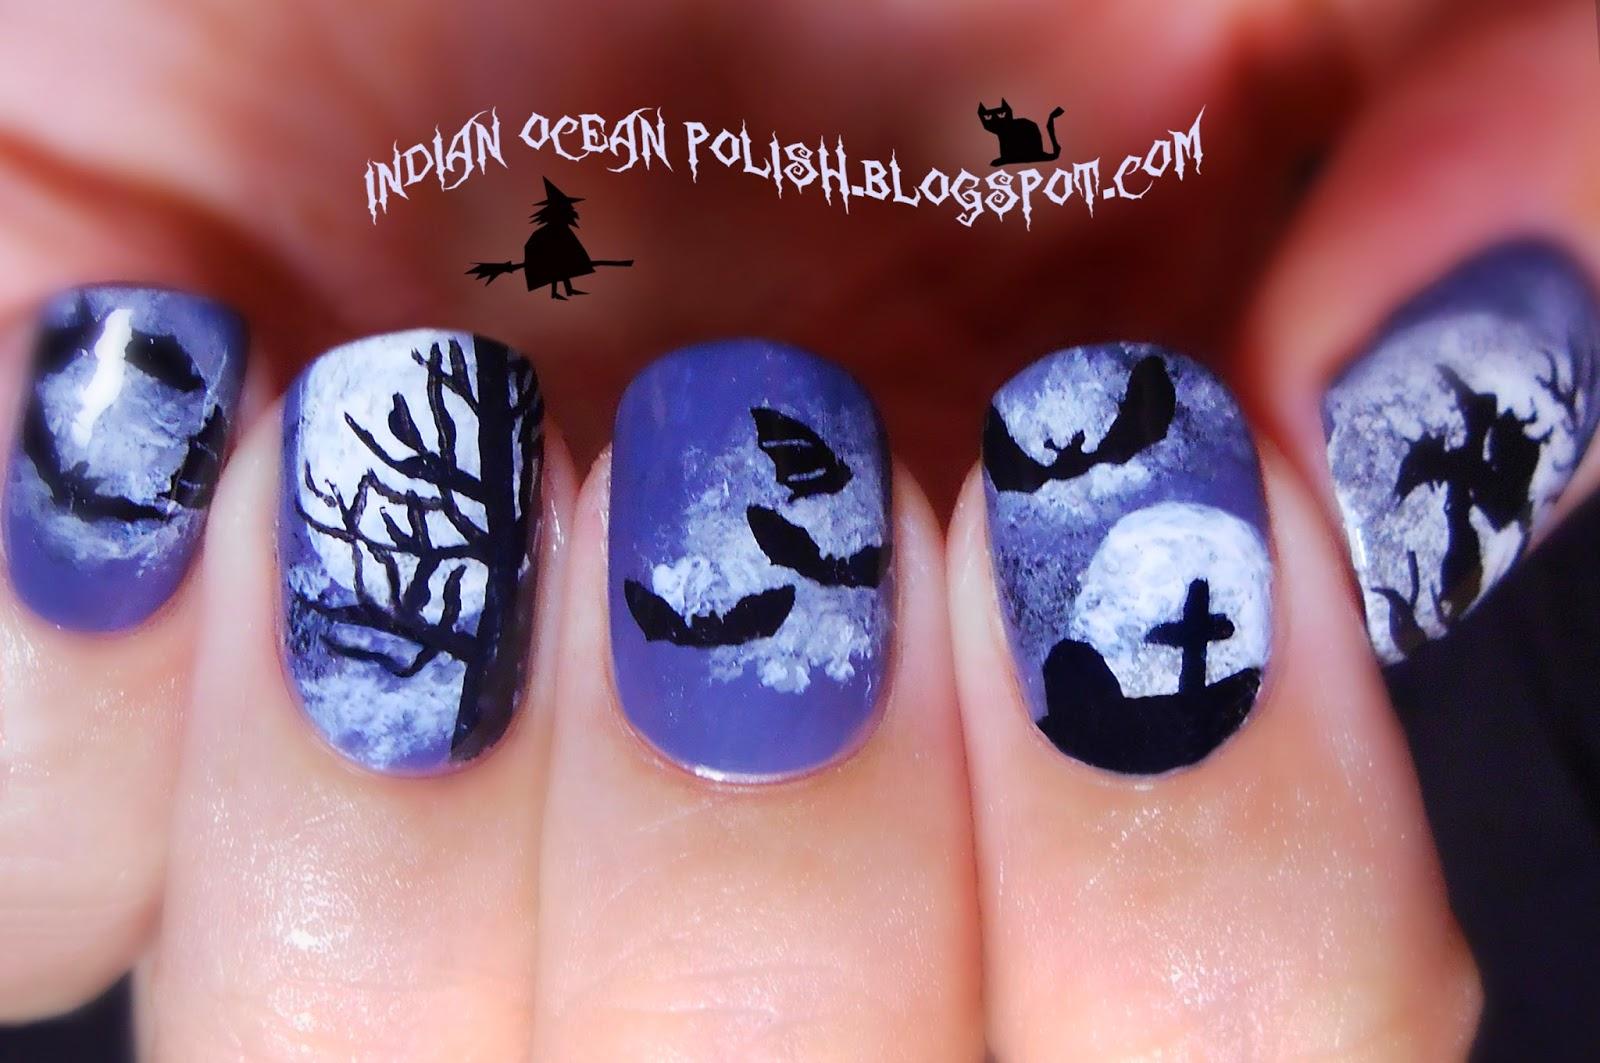 Indian Ocean Polish A Few Halloween Nail Art Ideas For 2013